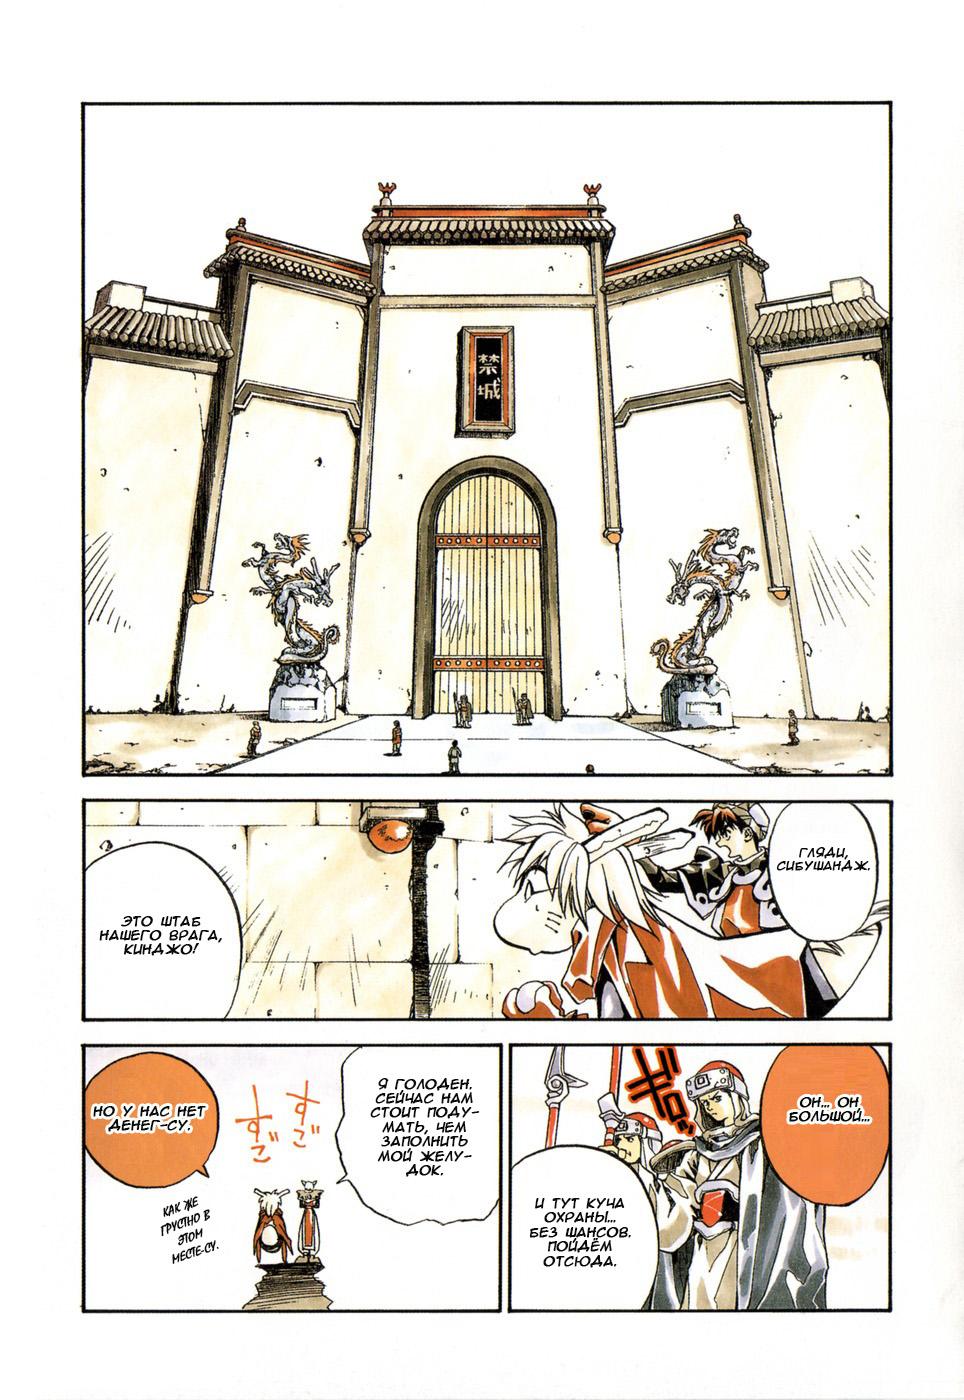 https://r1.ninemanga.com/comics/pic2/22/33366/344548/1512250144205.jpg Page 1